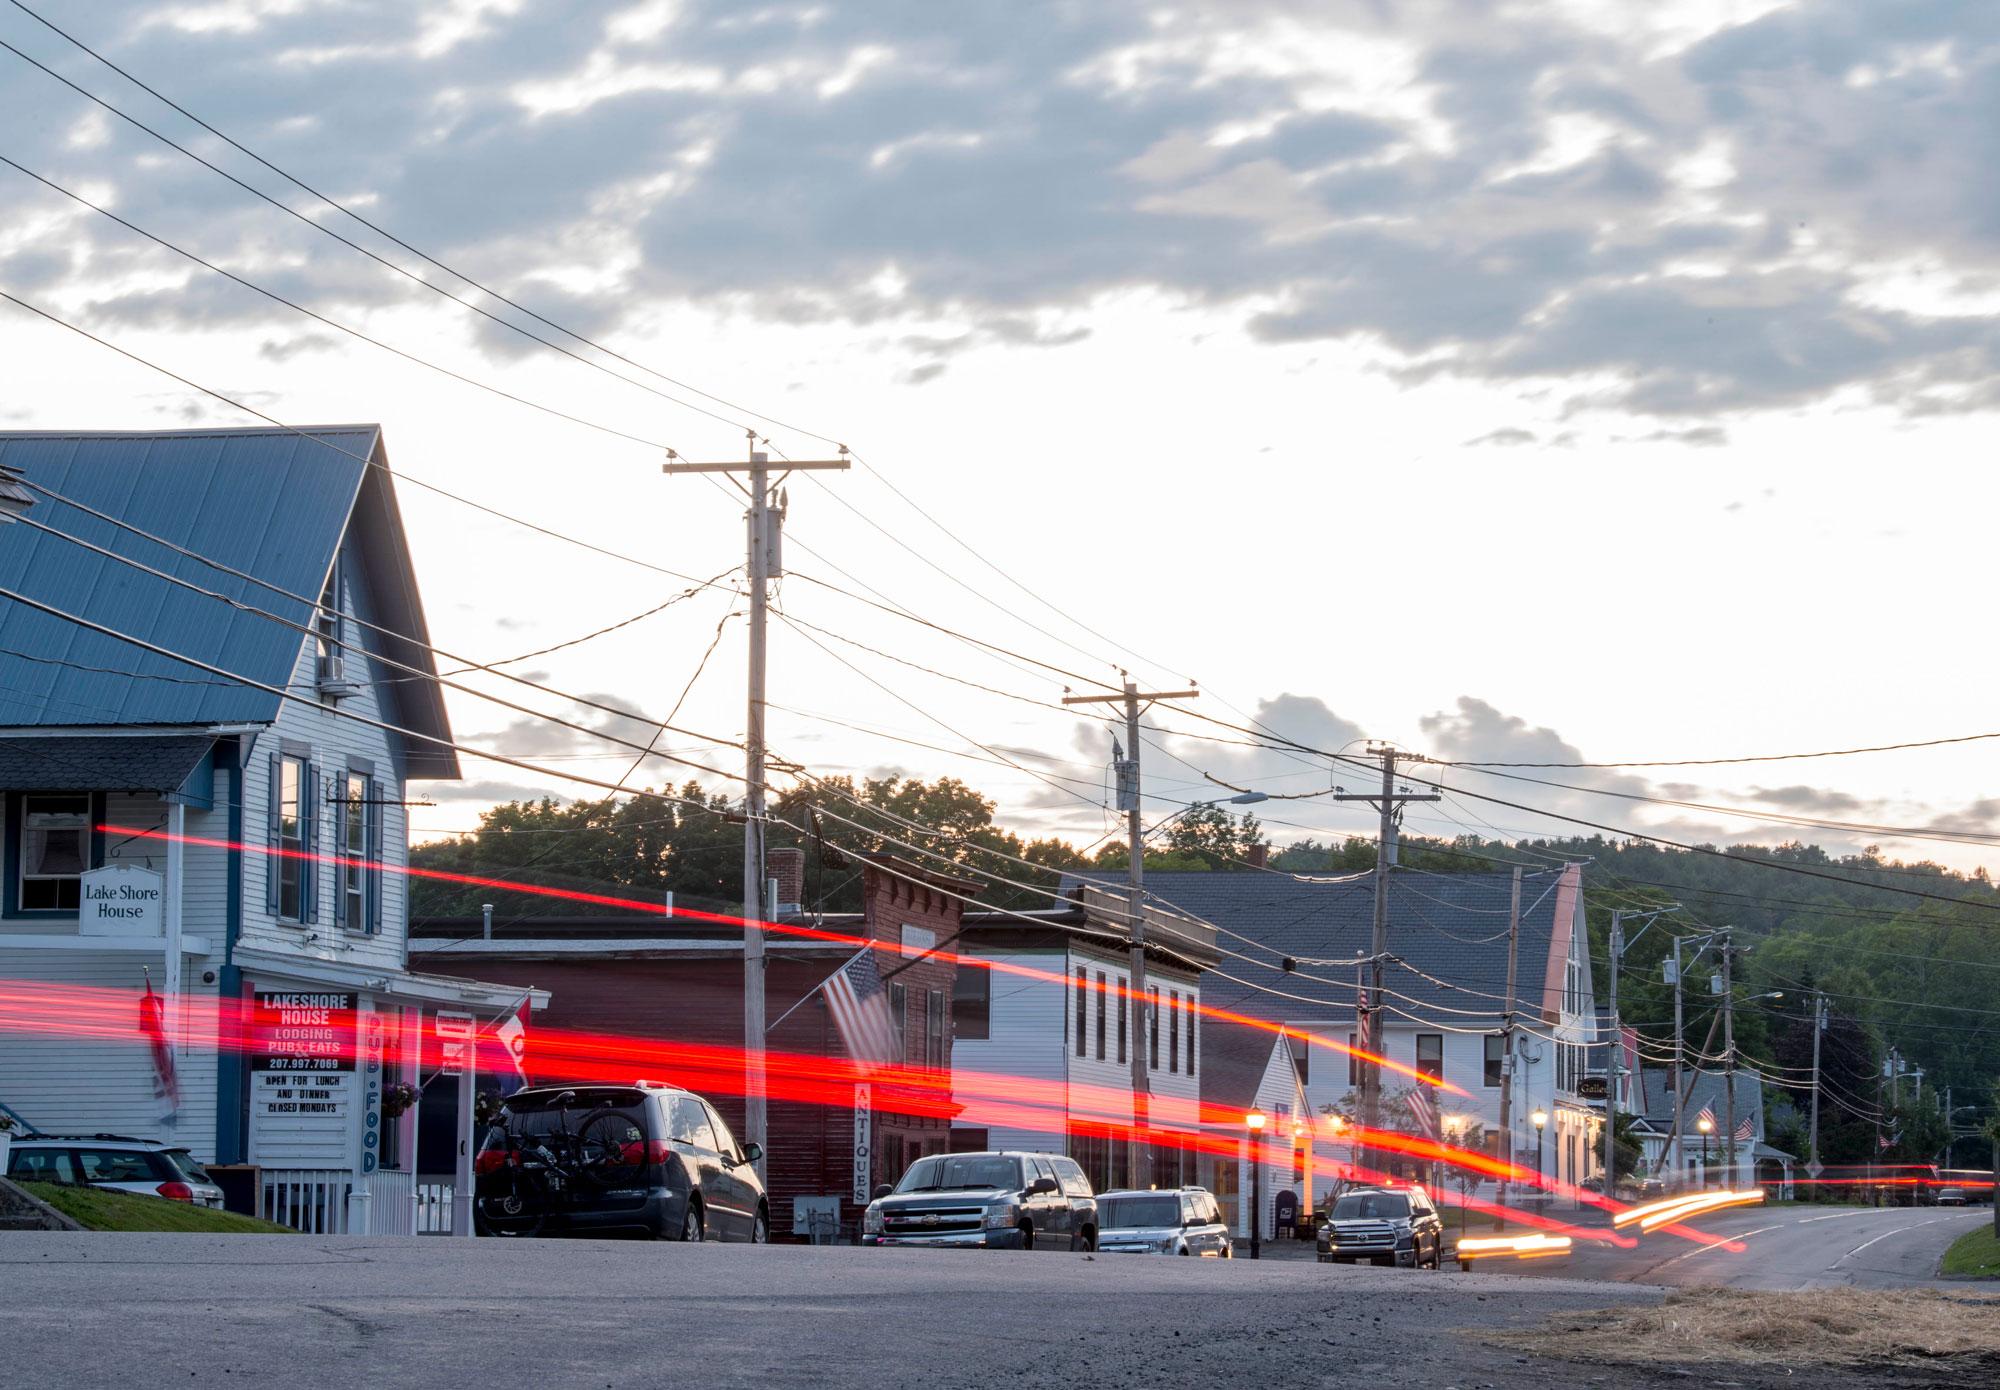 Traffic flows down Main Street in Monson, Maine